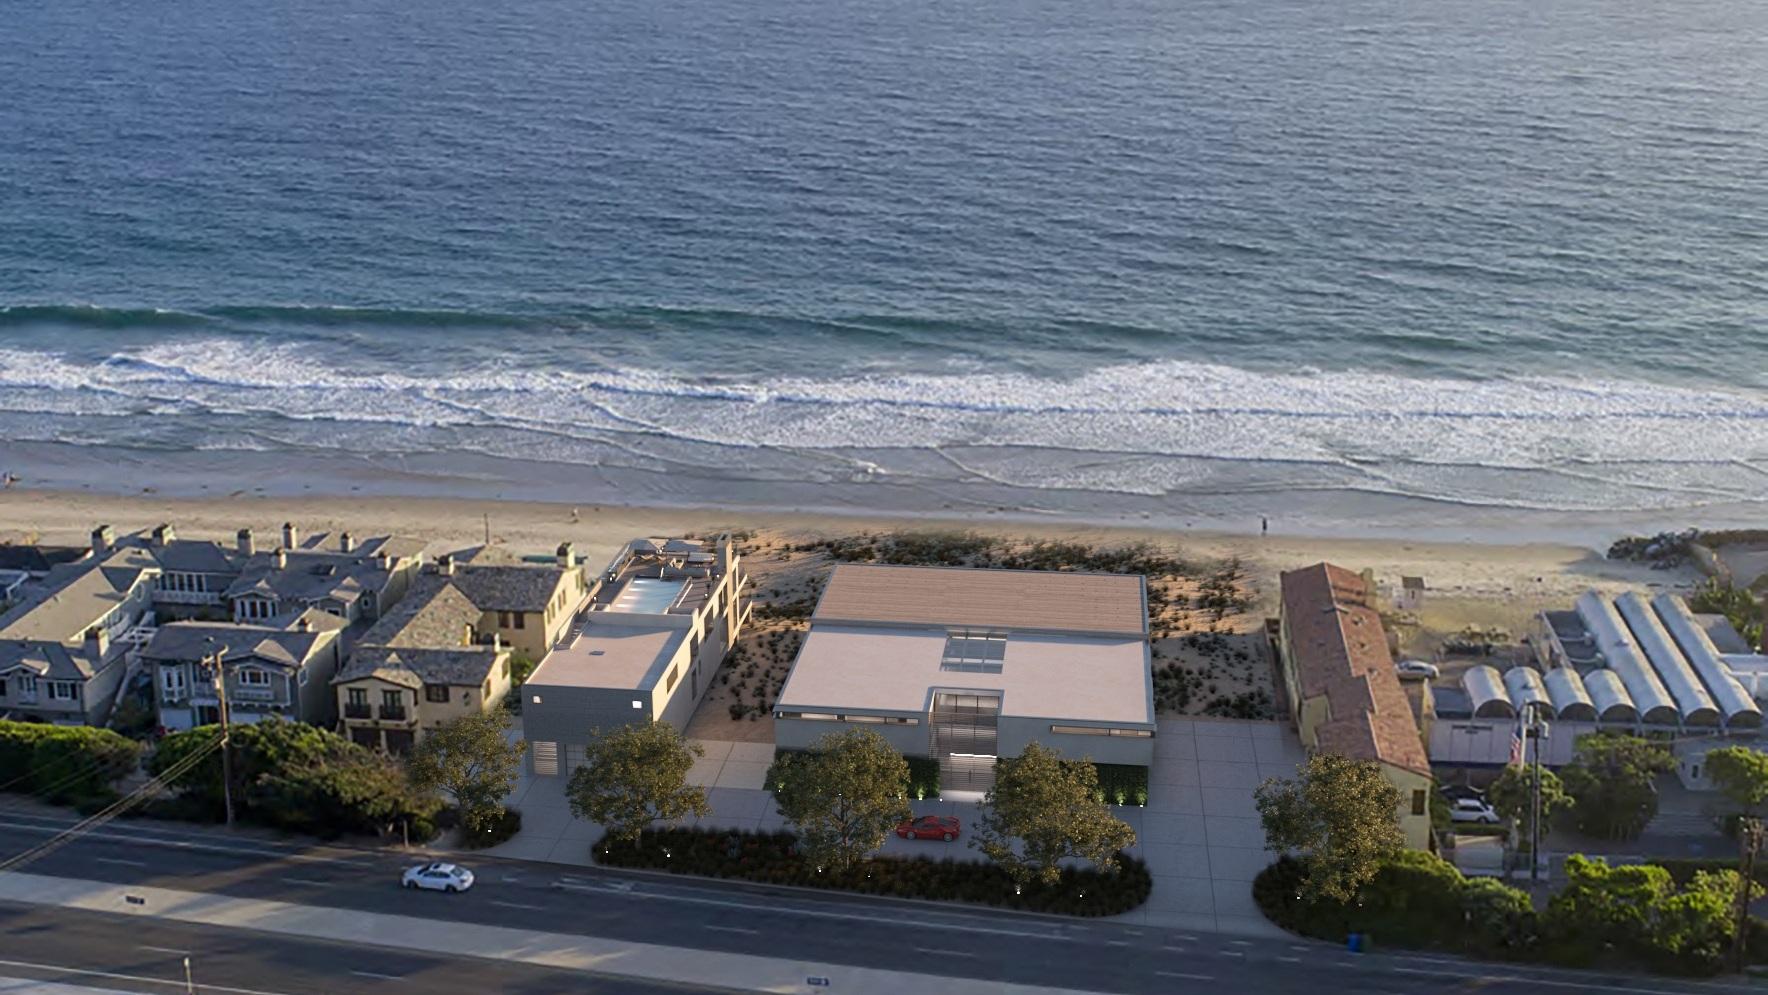 Malibu_Broad_Beach_1.jpg